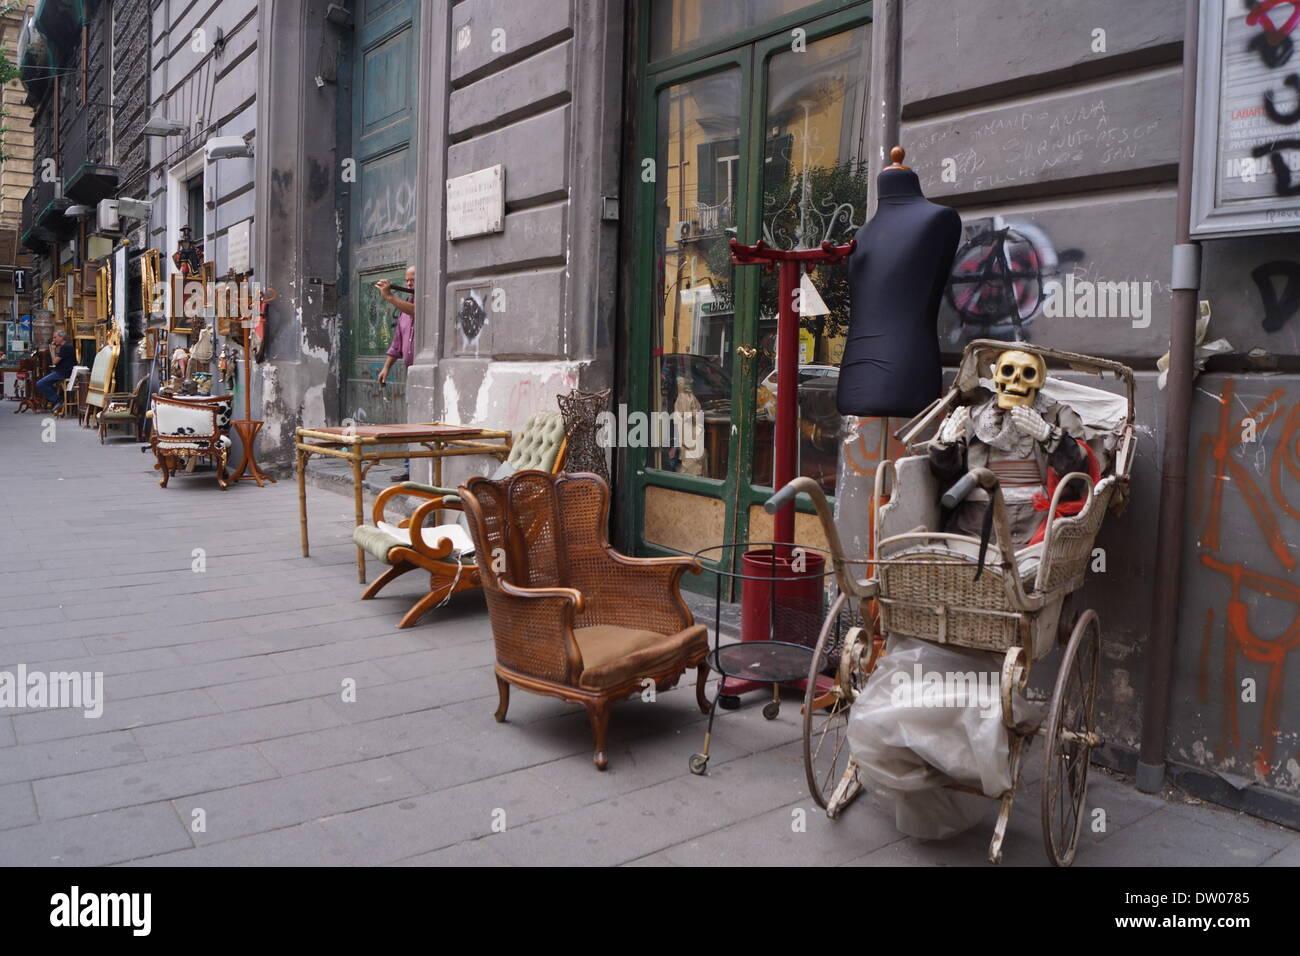 antique shop naples,italy - Stock Image